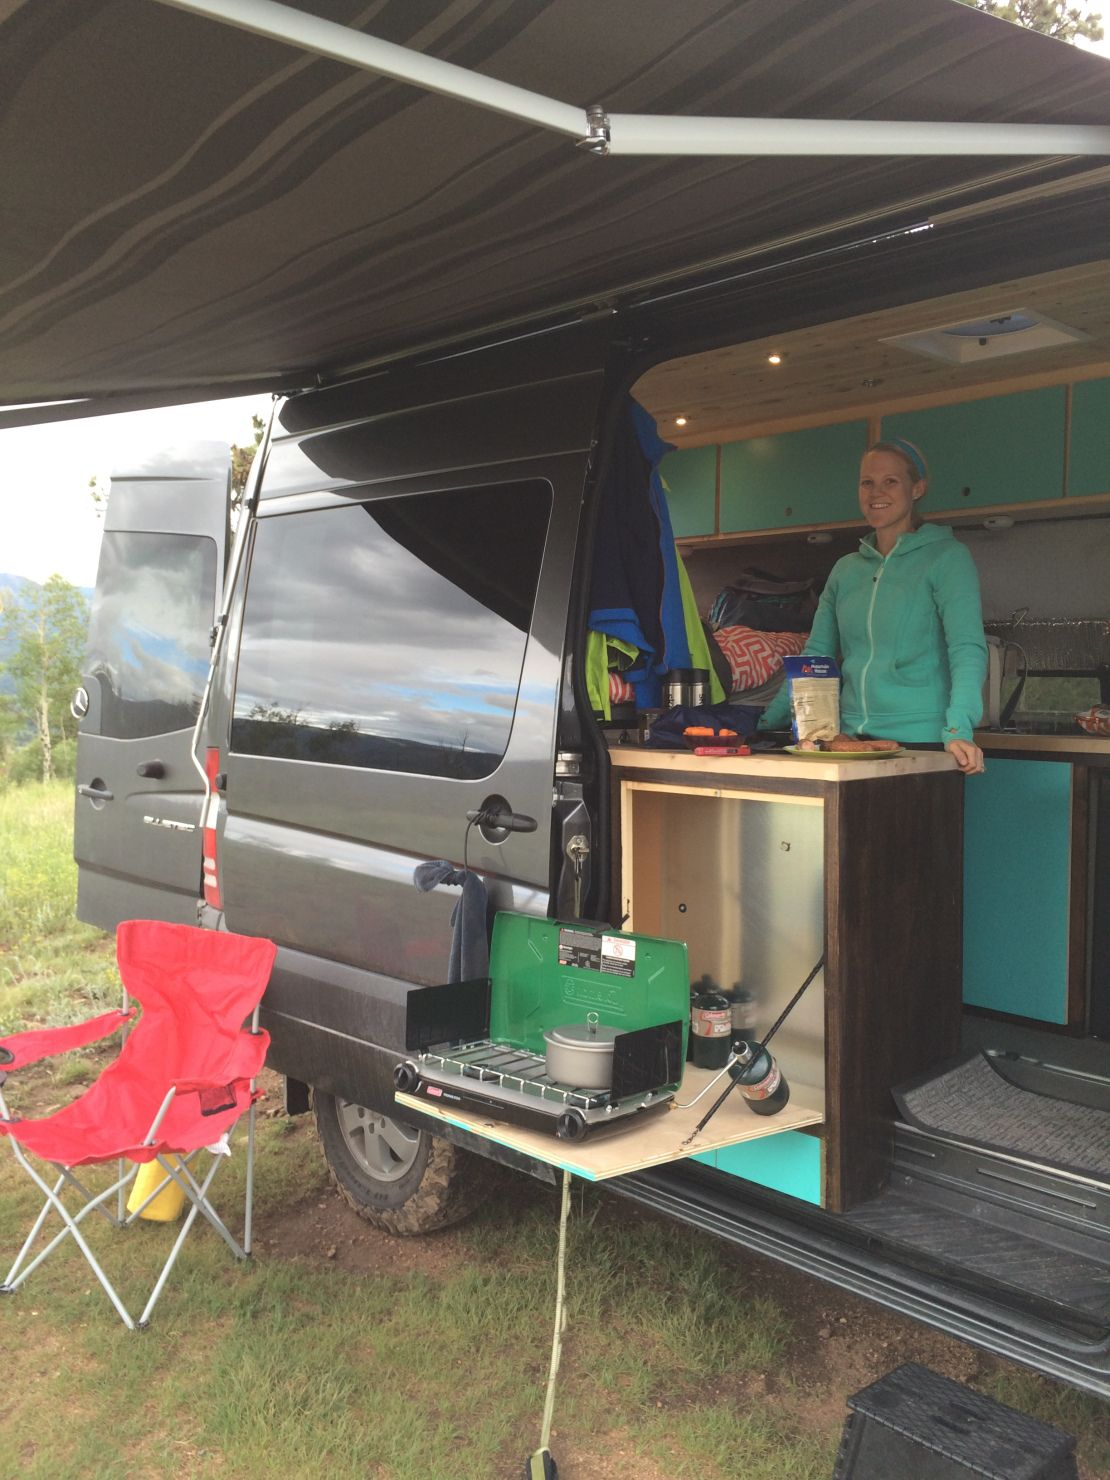 Sensationell Cailly Camper Van Kit For Delivery Vans Camping Fahrzeugausbau Youtube Https Www Youtube Com Watc Citroen Jumper Camper Van Fiat Ducato